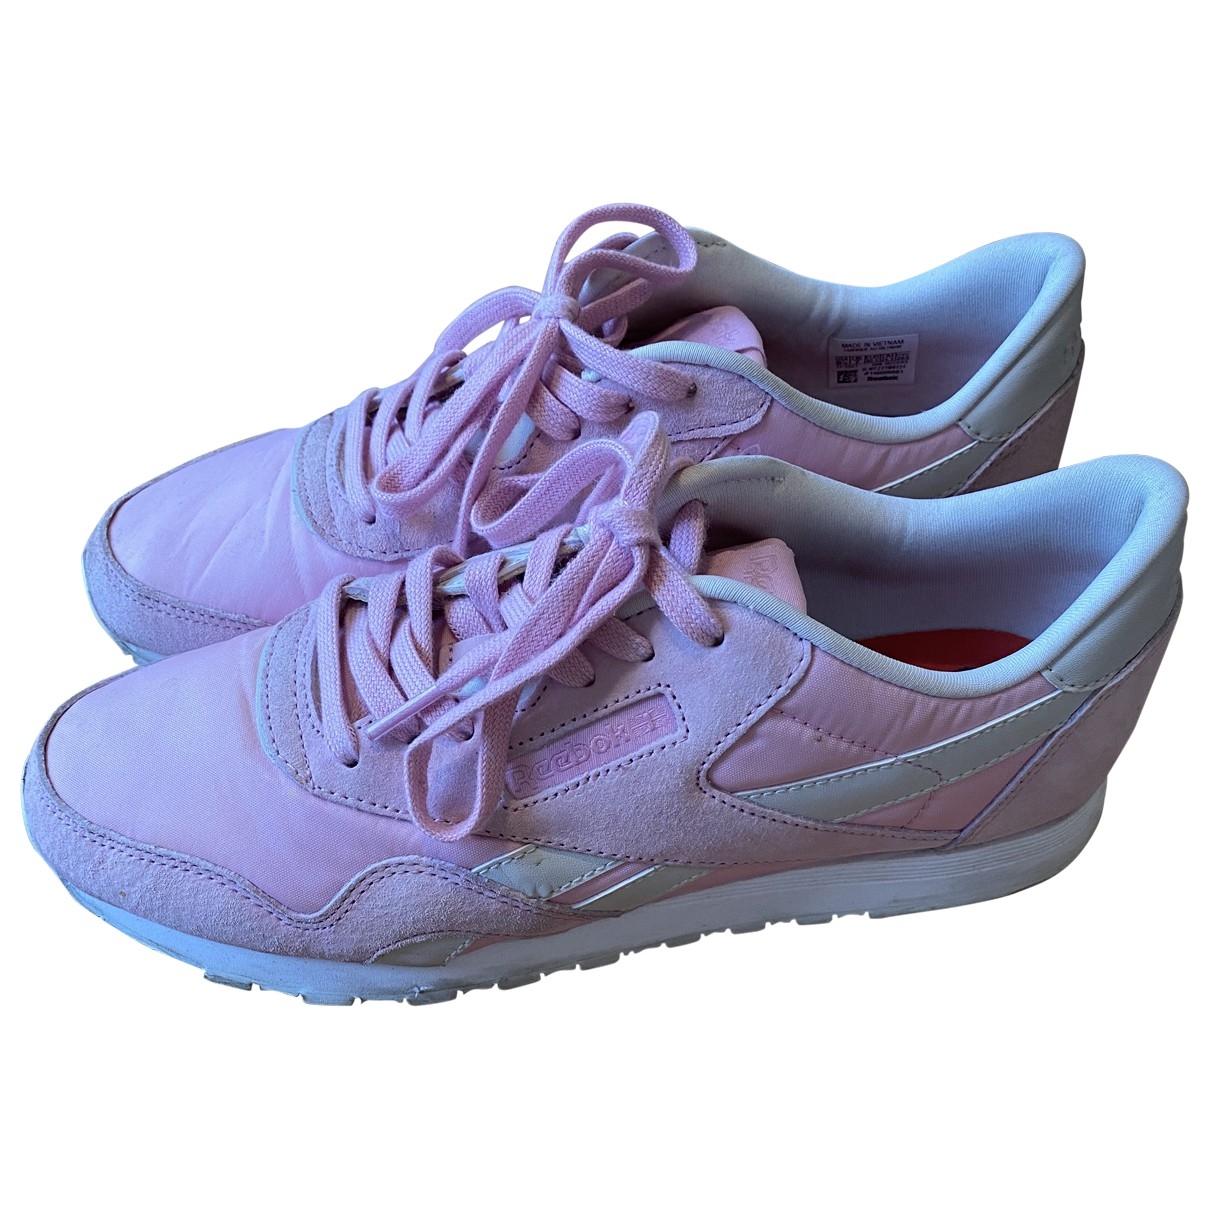 Reebok - Baskets   pour femme en suede - rose